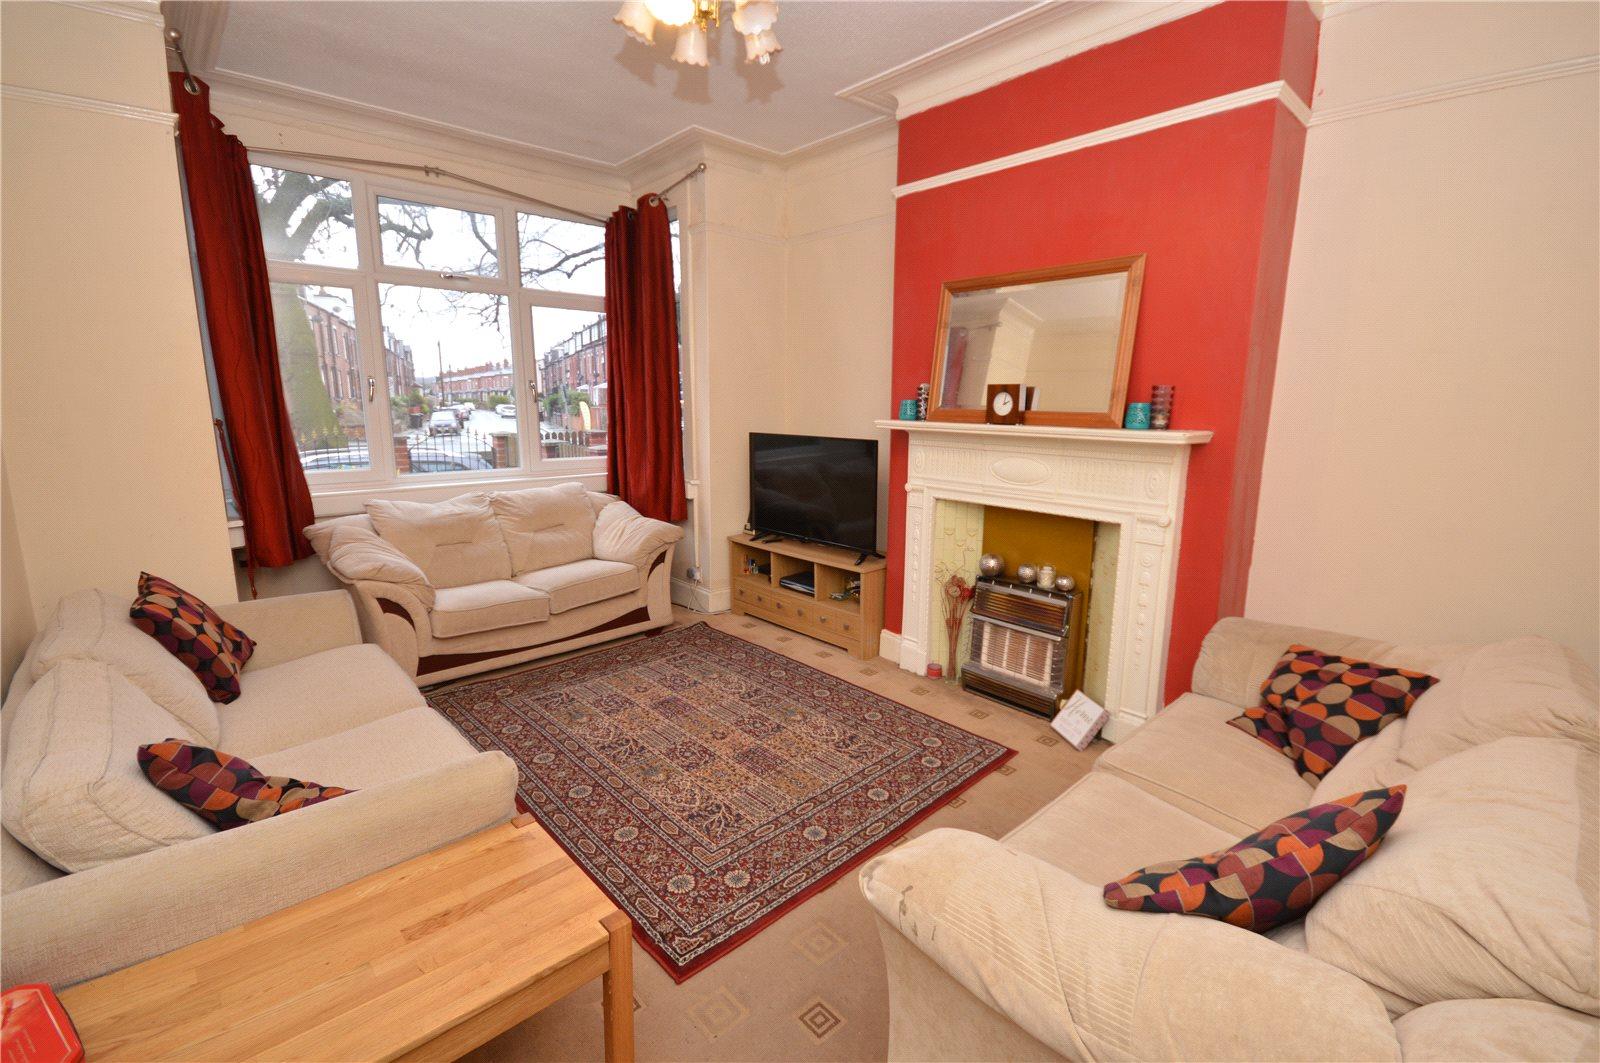 property for sale in Beeston, interior reception room